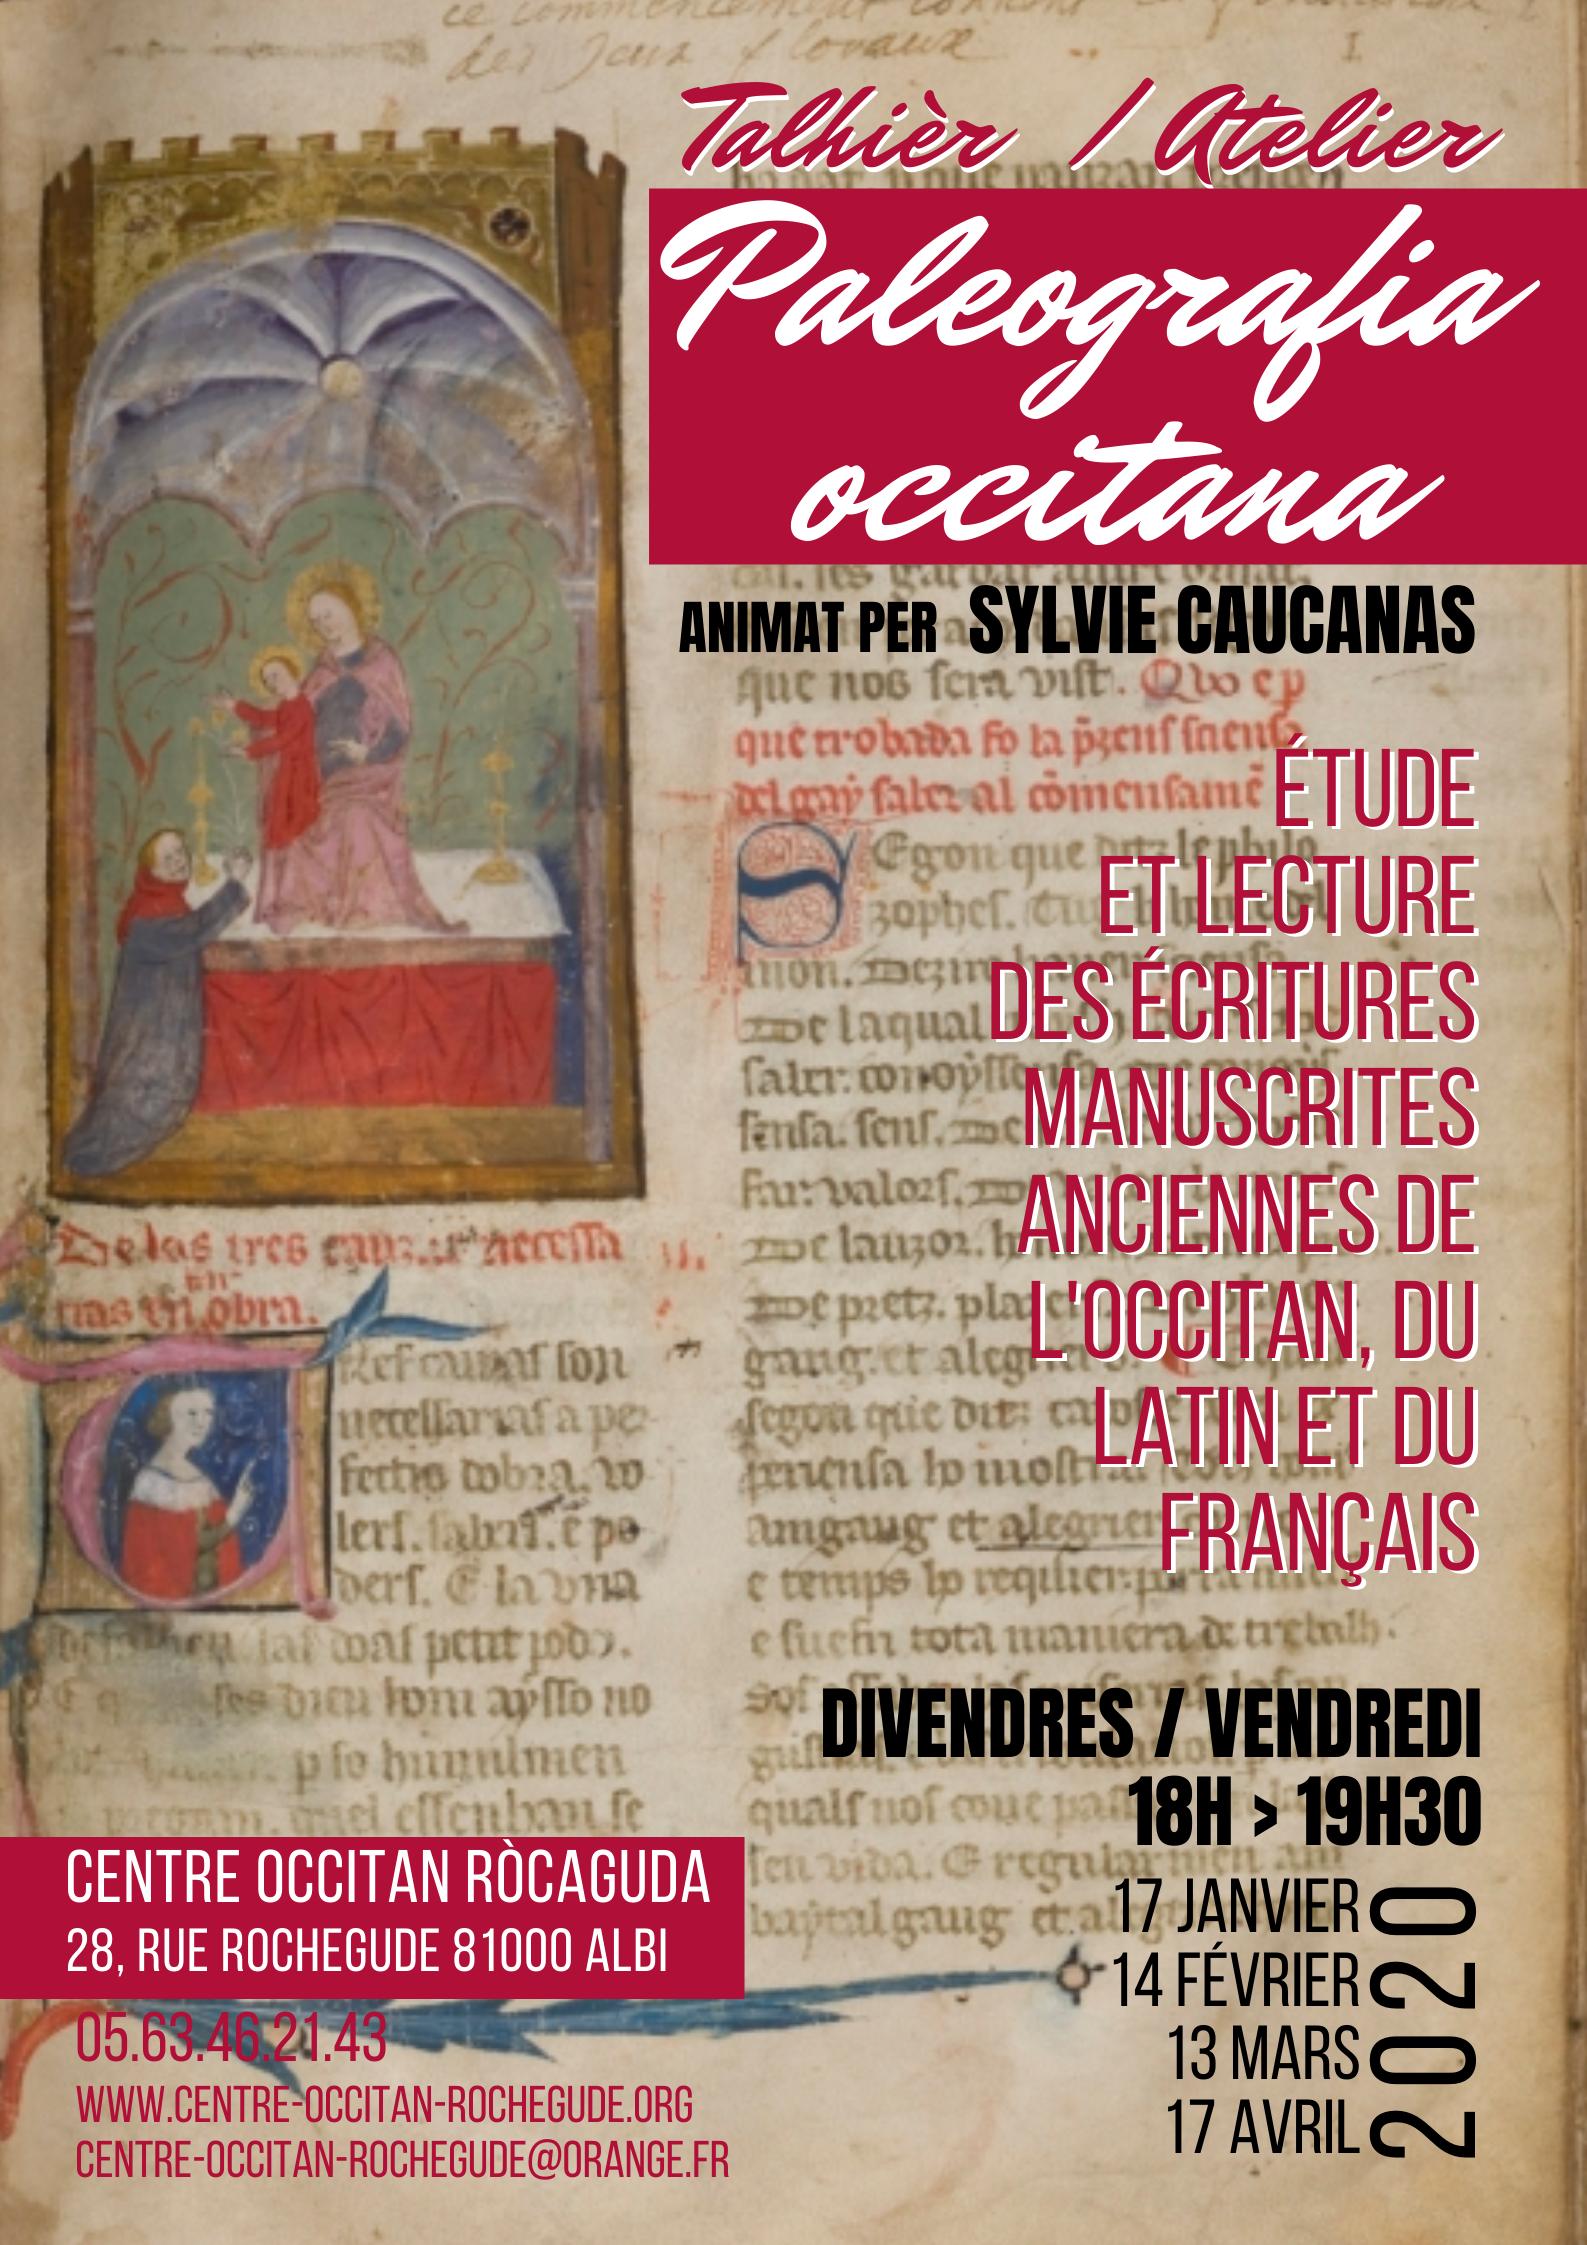 Paleografia occitana